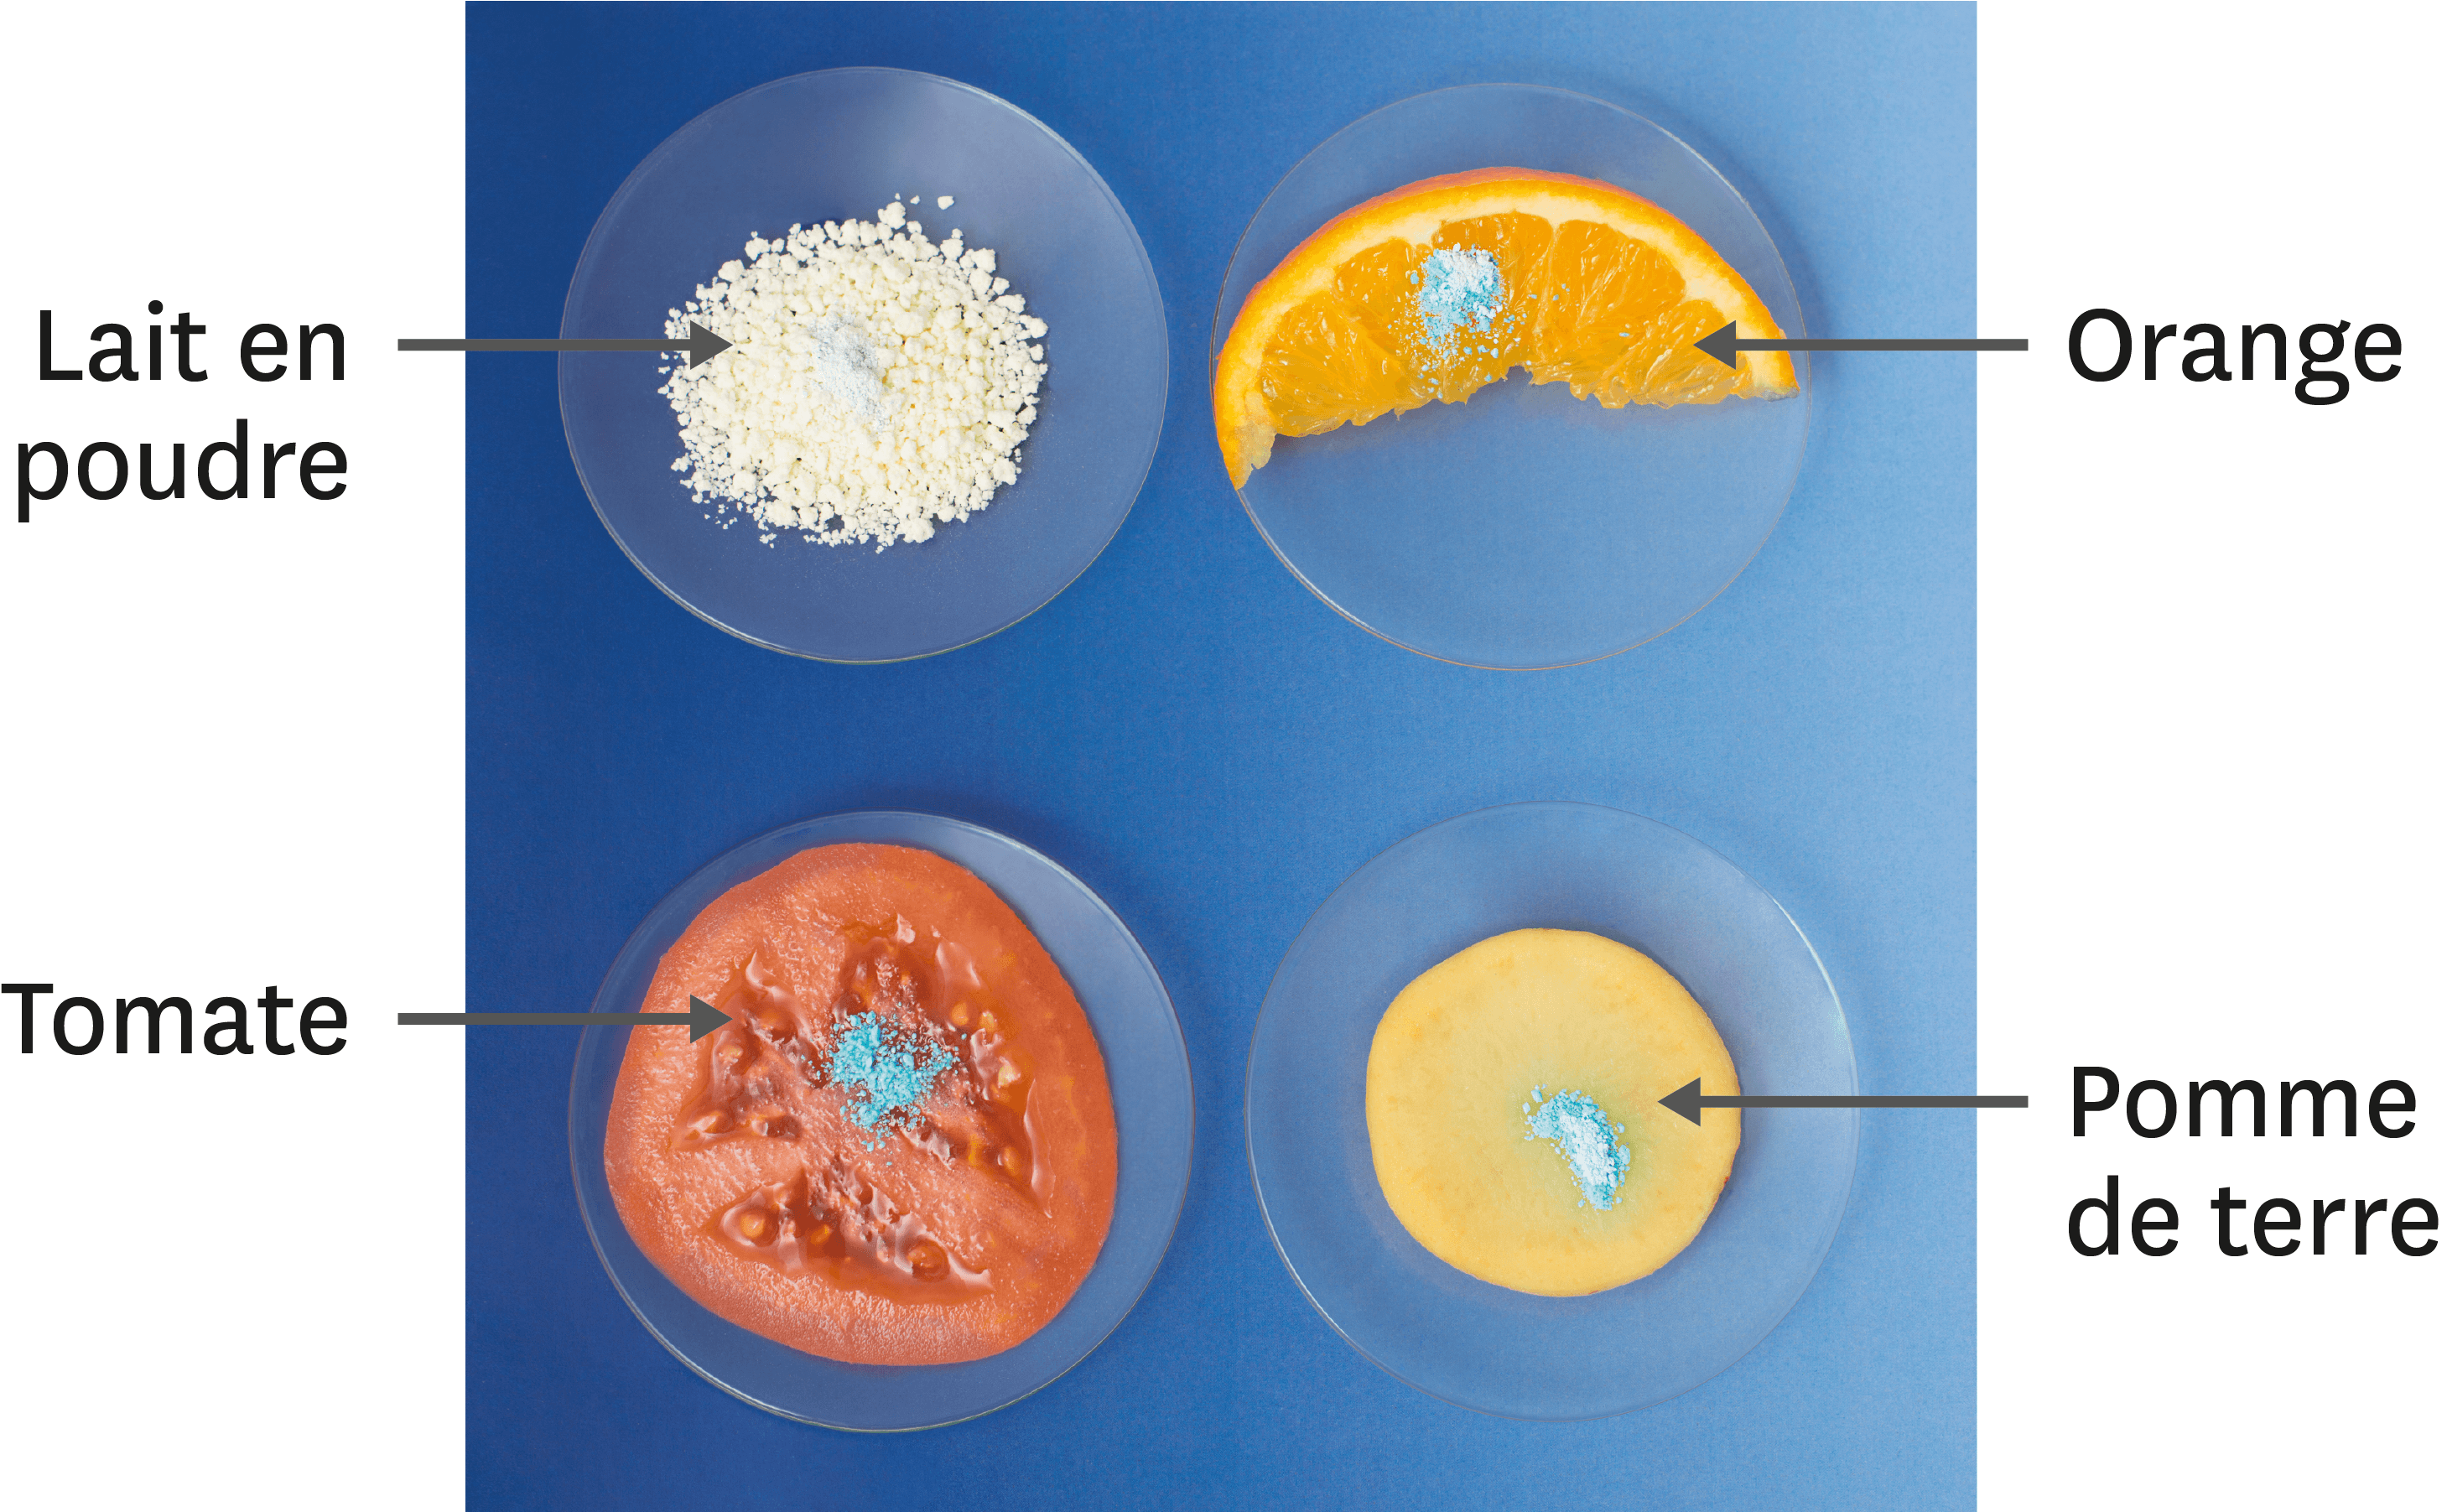 <stamp theme='pc-green1'>Doc. 1</stamp> Orange et lait en poudre.